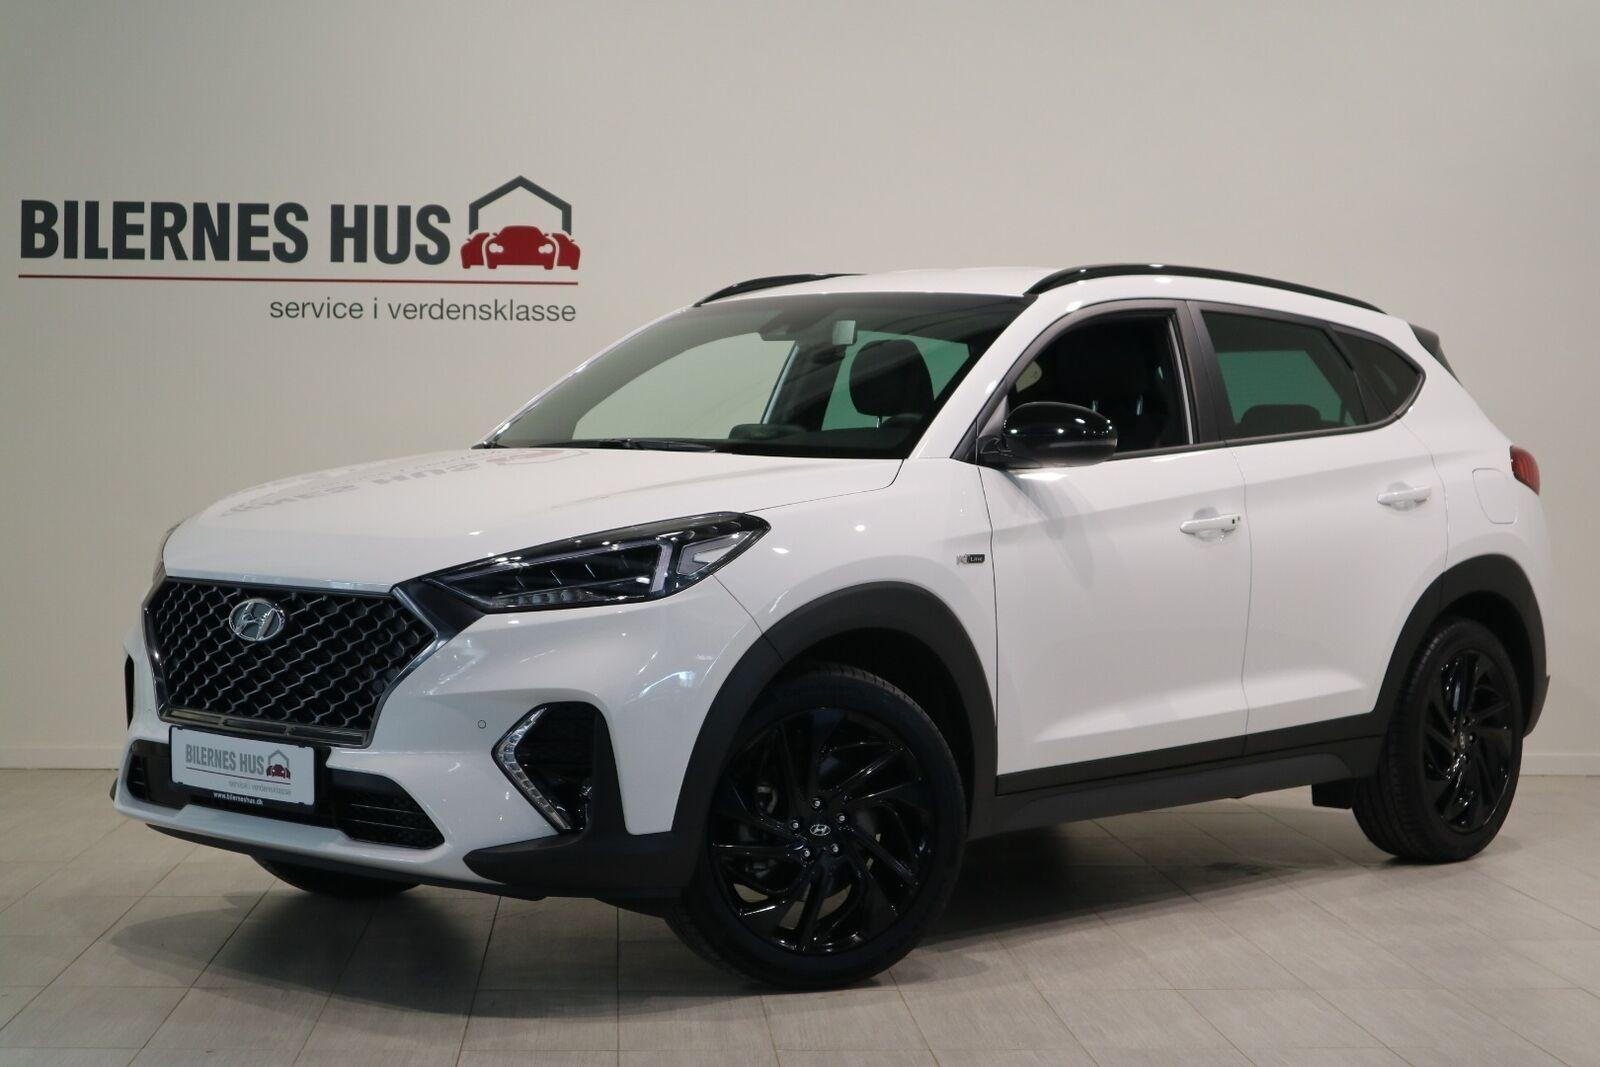 Hyundai Tucson Billede 5